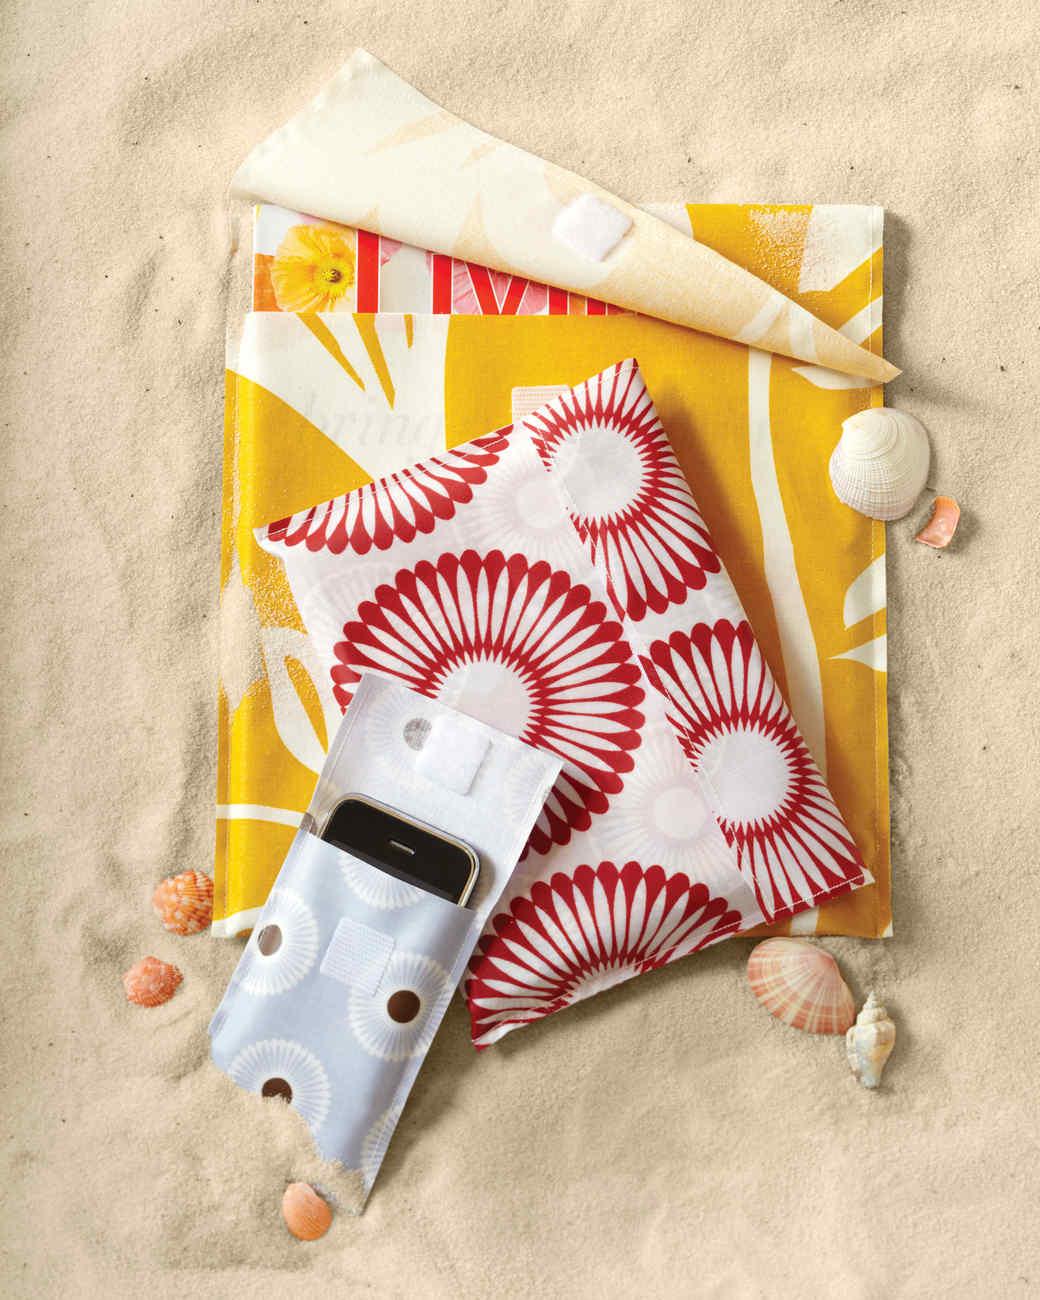 Summer Sewing Projects | Martha Stewart